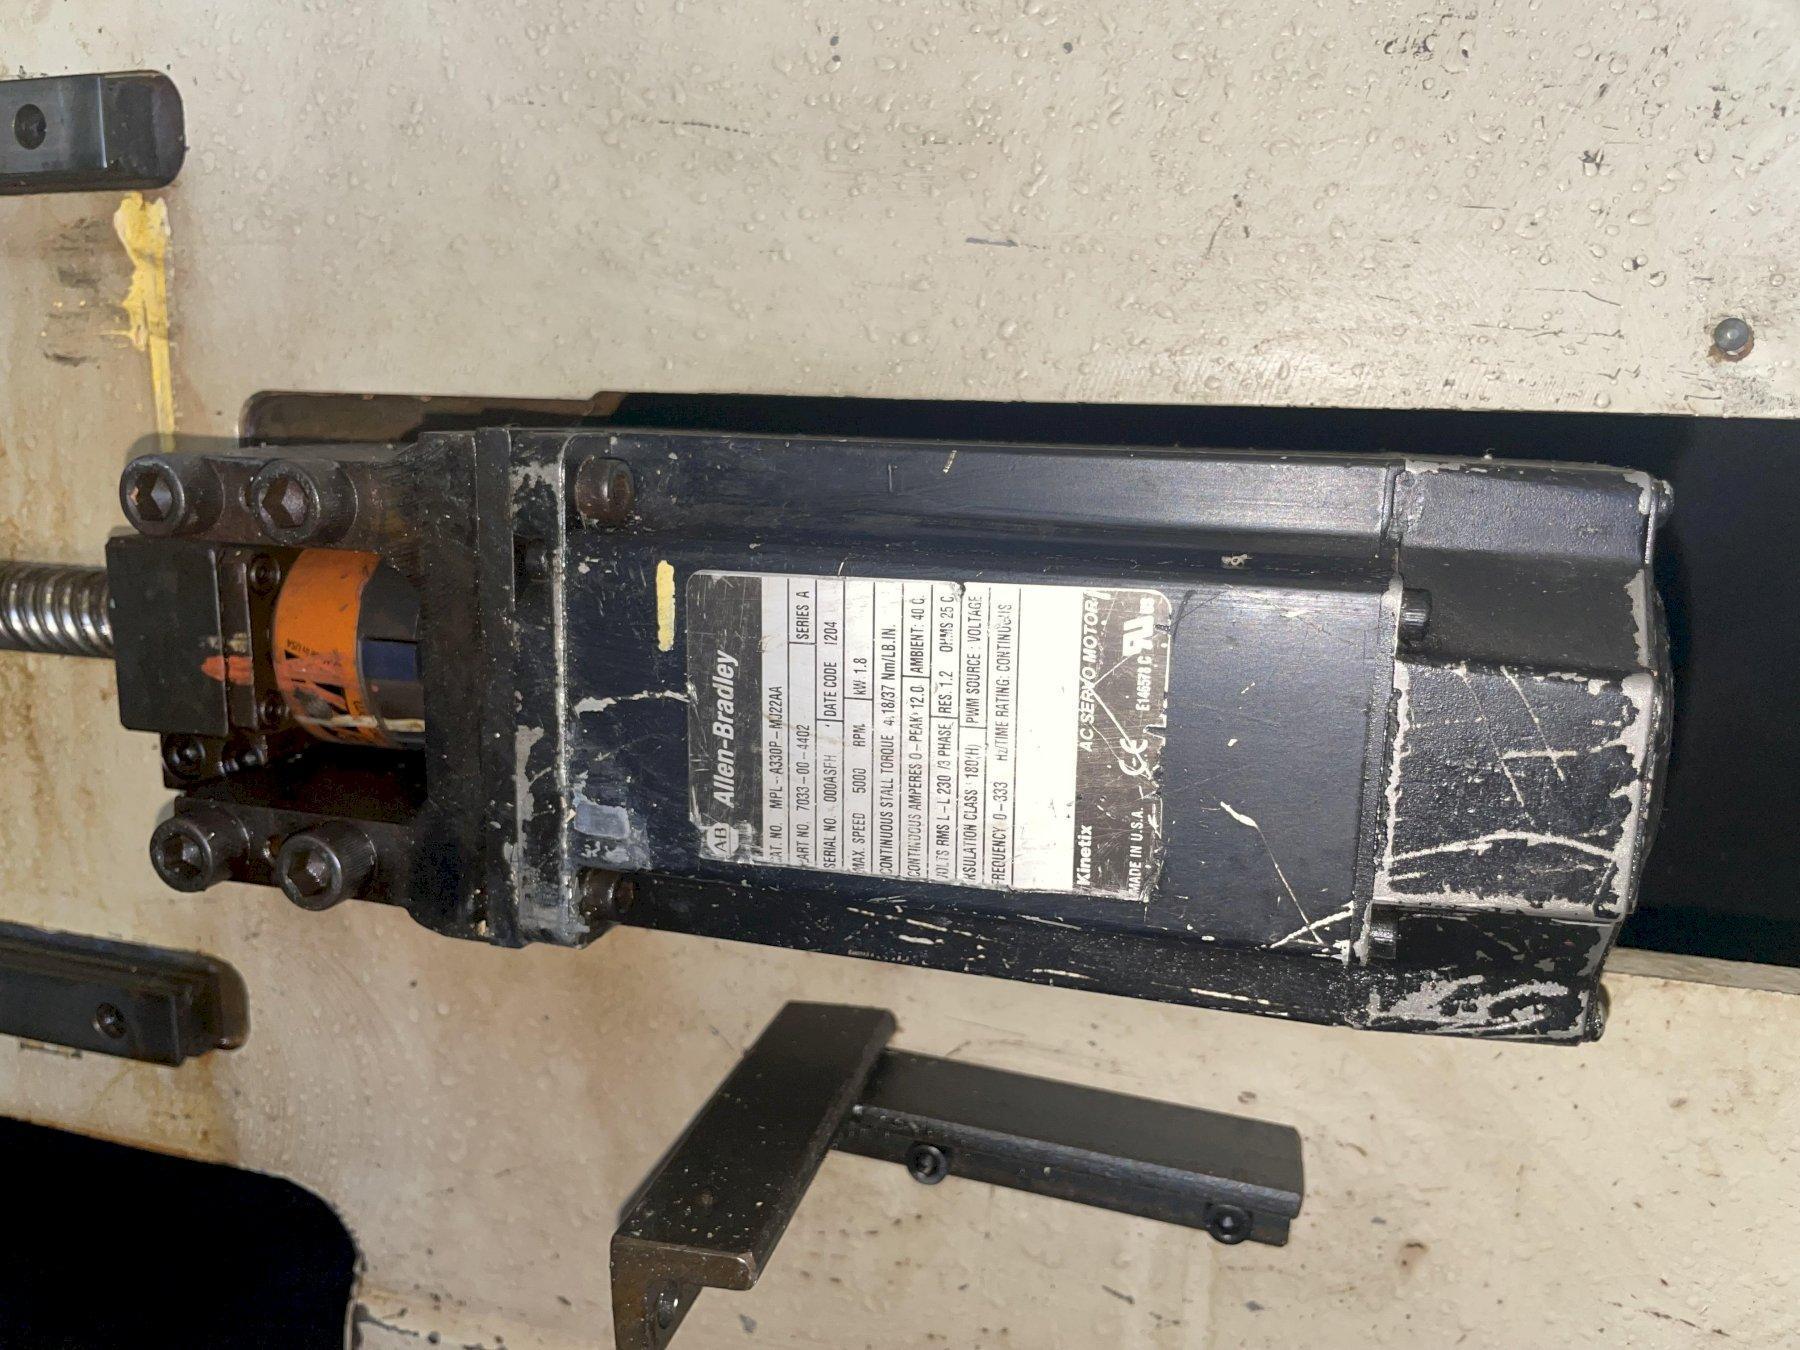 "7/8"" CROWN UNLIMITED MODEL #MTSB-M2-7-2004 CNC MULTI-TUBE SERPENTINE ROTARY TUBE BENDER: STOCK #15437"